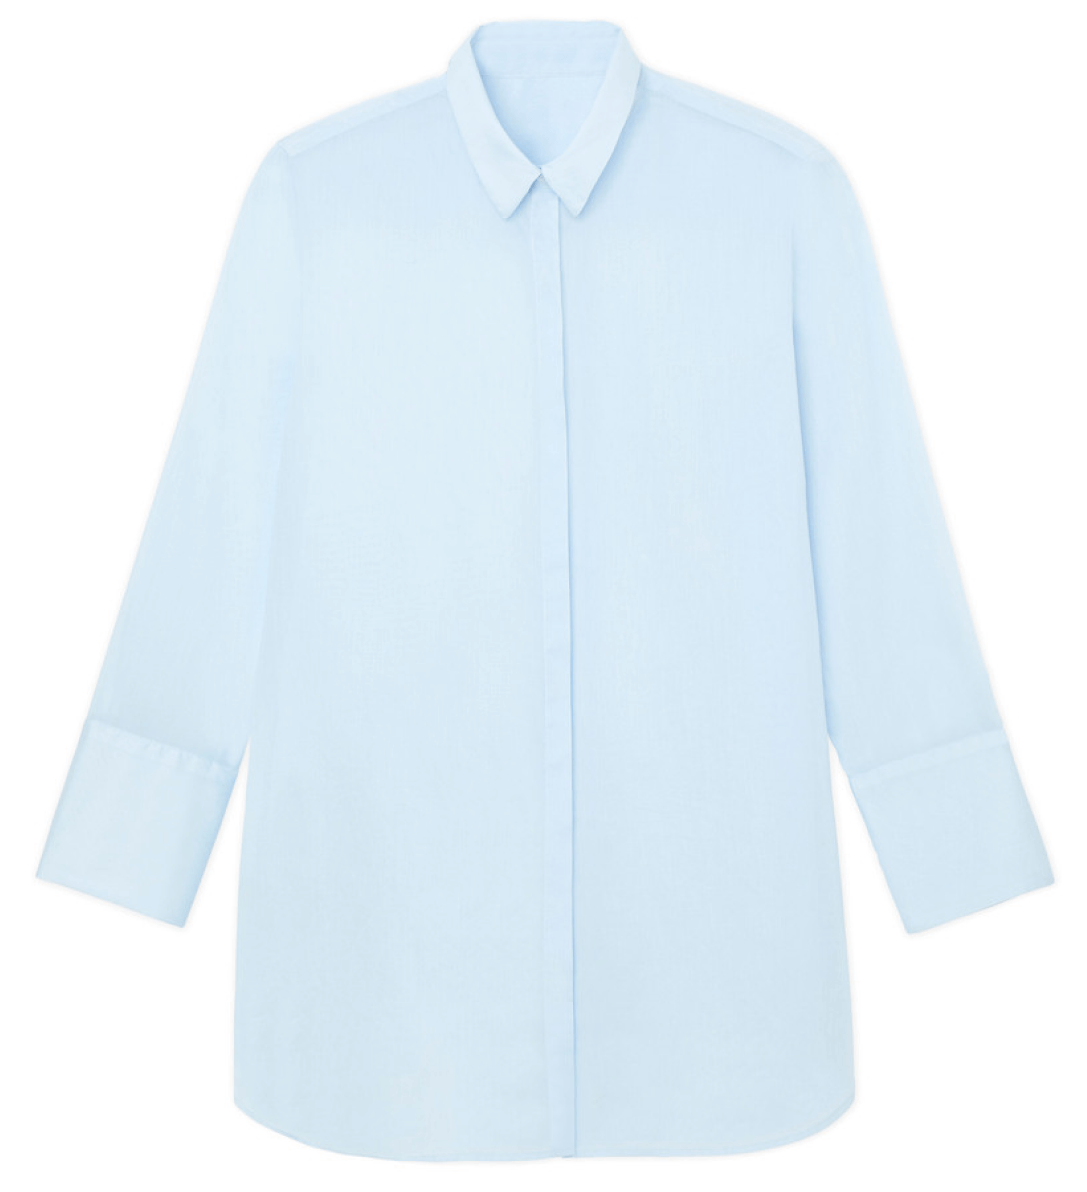 Miné Mediterranean Shirt